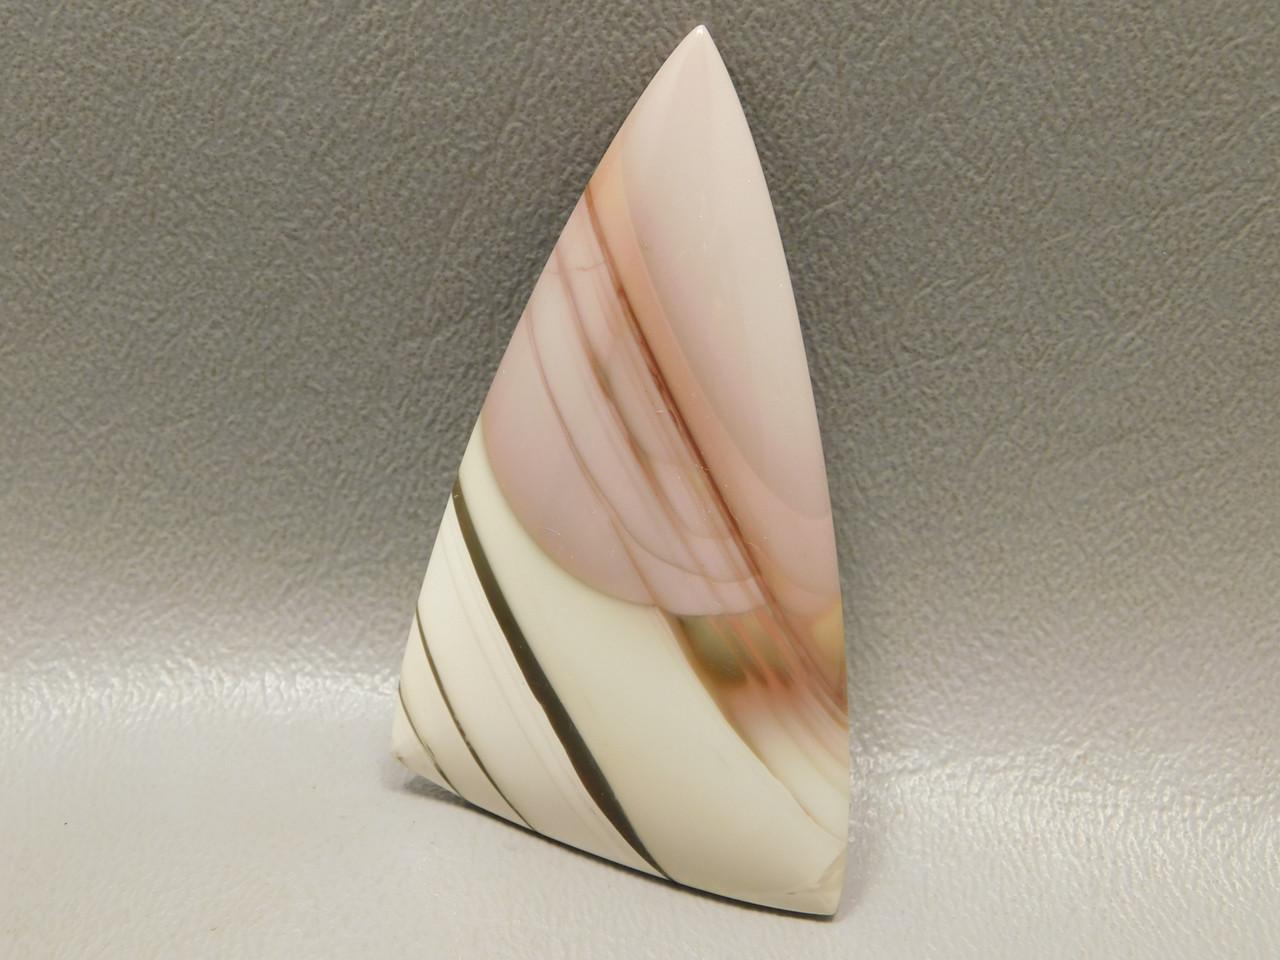 Imperial Jasper Large Triangle Collector Cabochon Fine Stone #XL30